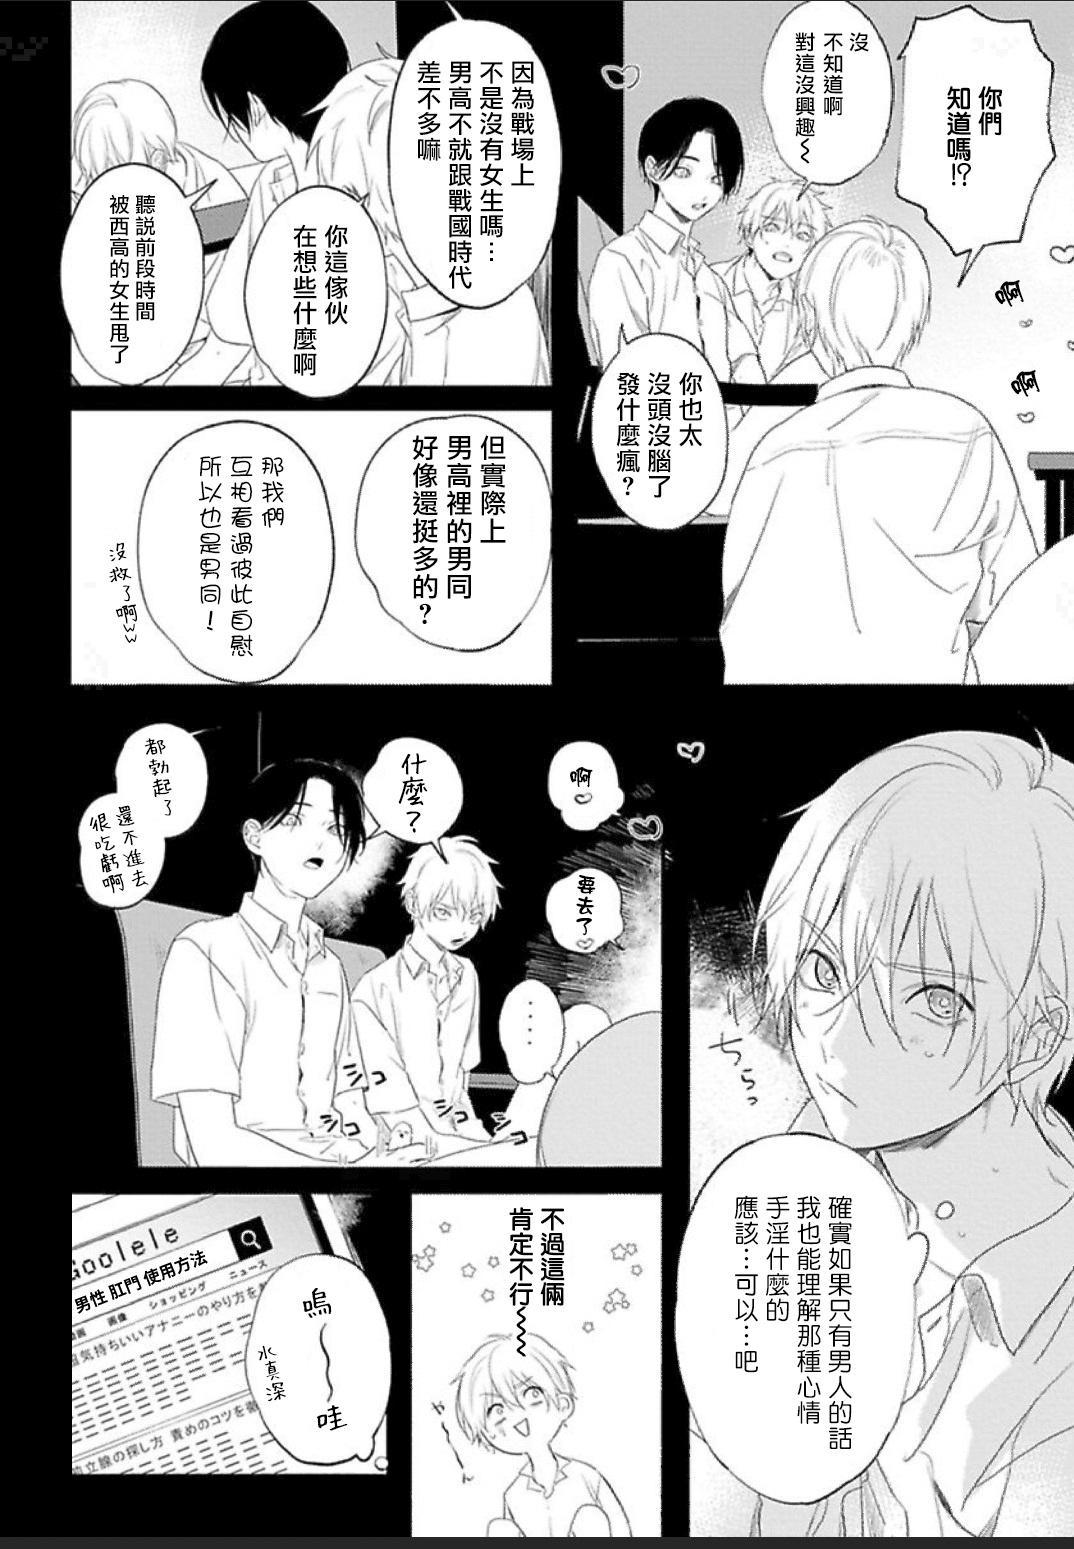 [Utata Hakuto] Houkago Virginity - Virginity afterschool 1-5 完结 [Chinese] [拾荒者汉化组] [Digital] 3